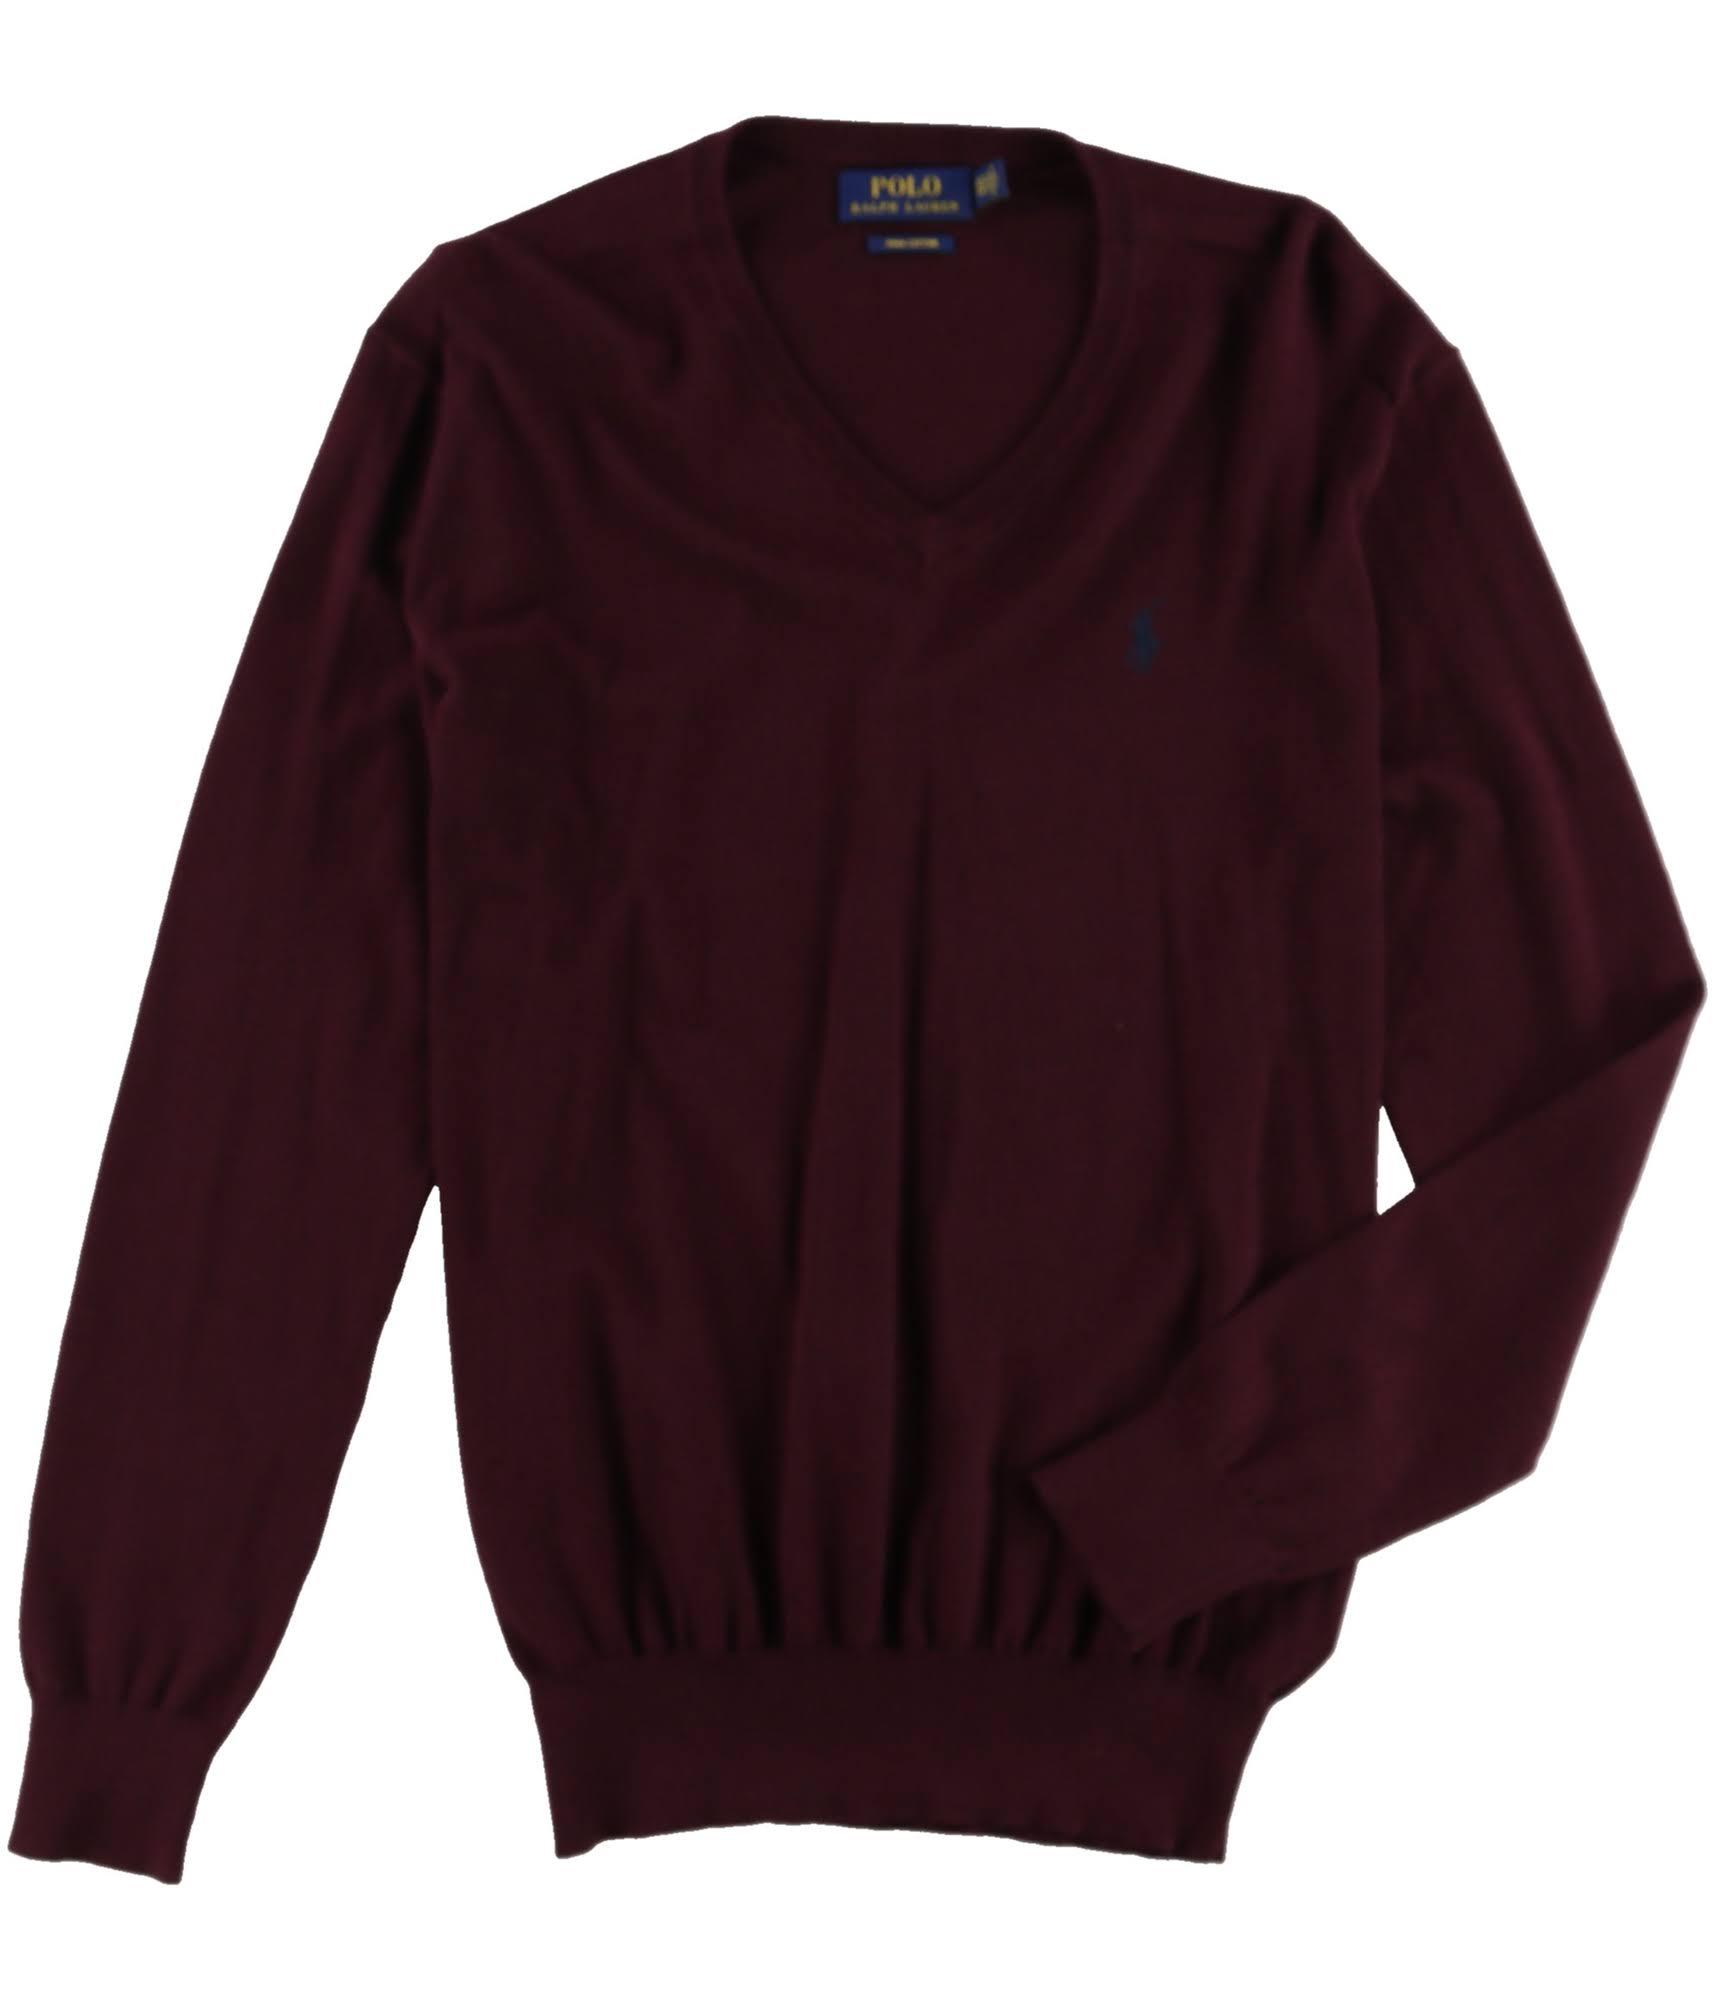 Maglione Knit Italianre Lauren Ralph Pullover Mens Xs Ls 54RjLq3Ac